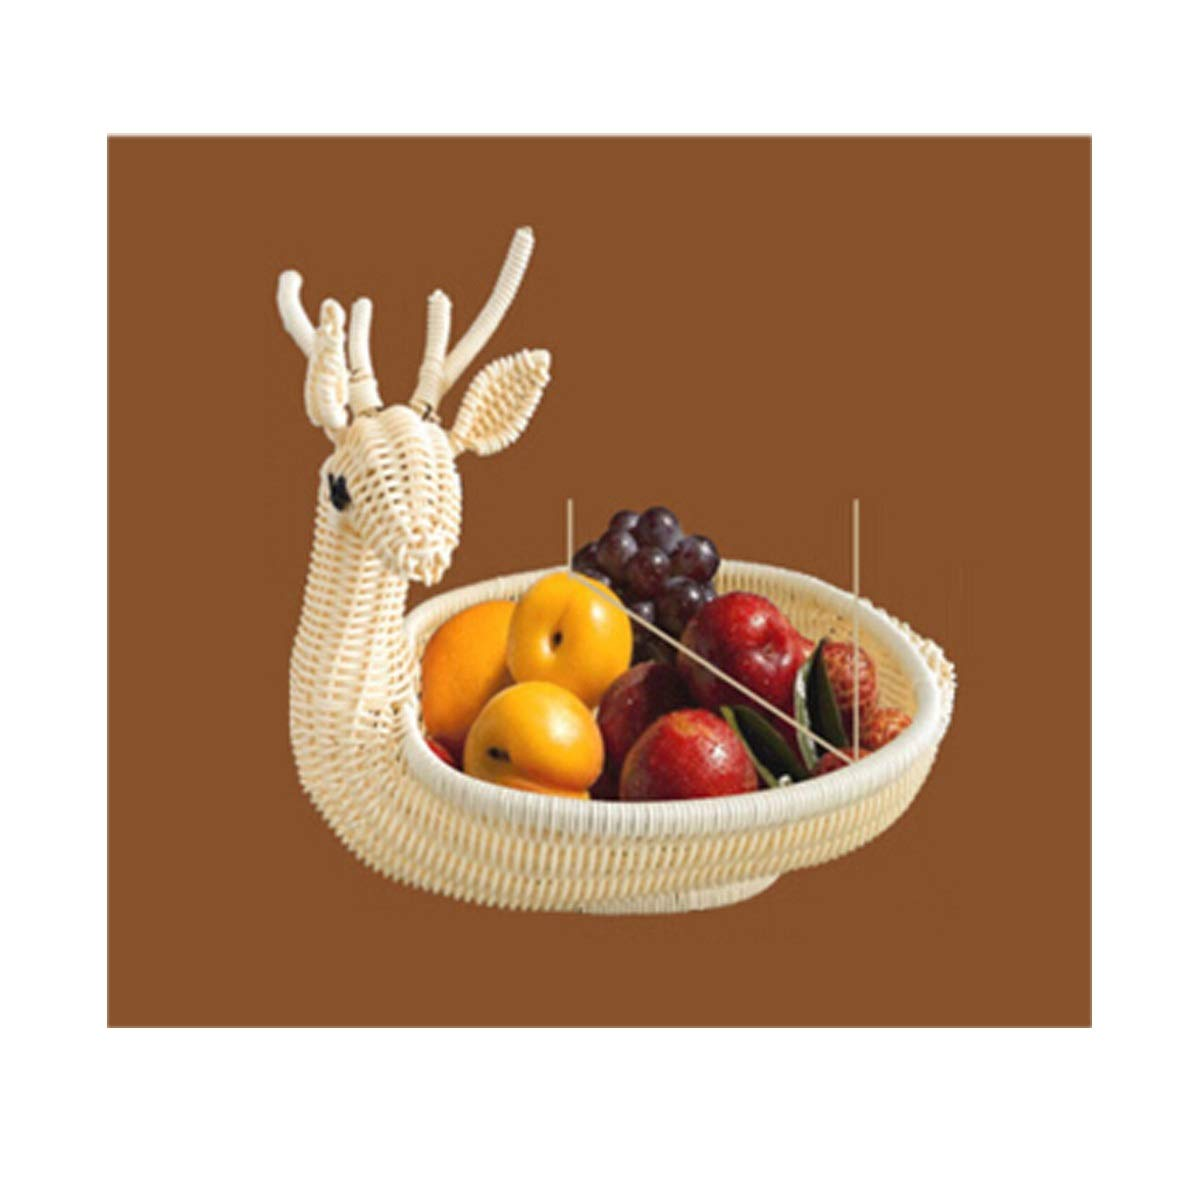 QINRUIKUANGSHAN Cute Storage Box, Candy Tray, Fruit Basket, Home Modern Living Room Bread Basket, Rattan Plastic Basket Bread Basket, (Color : B) by QINRUIKUANGSHAN